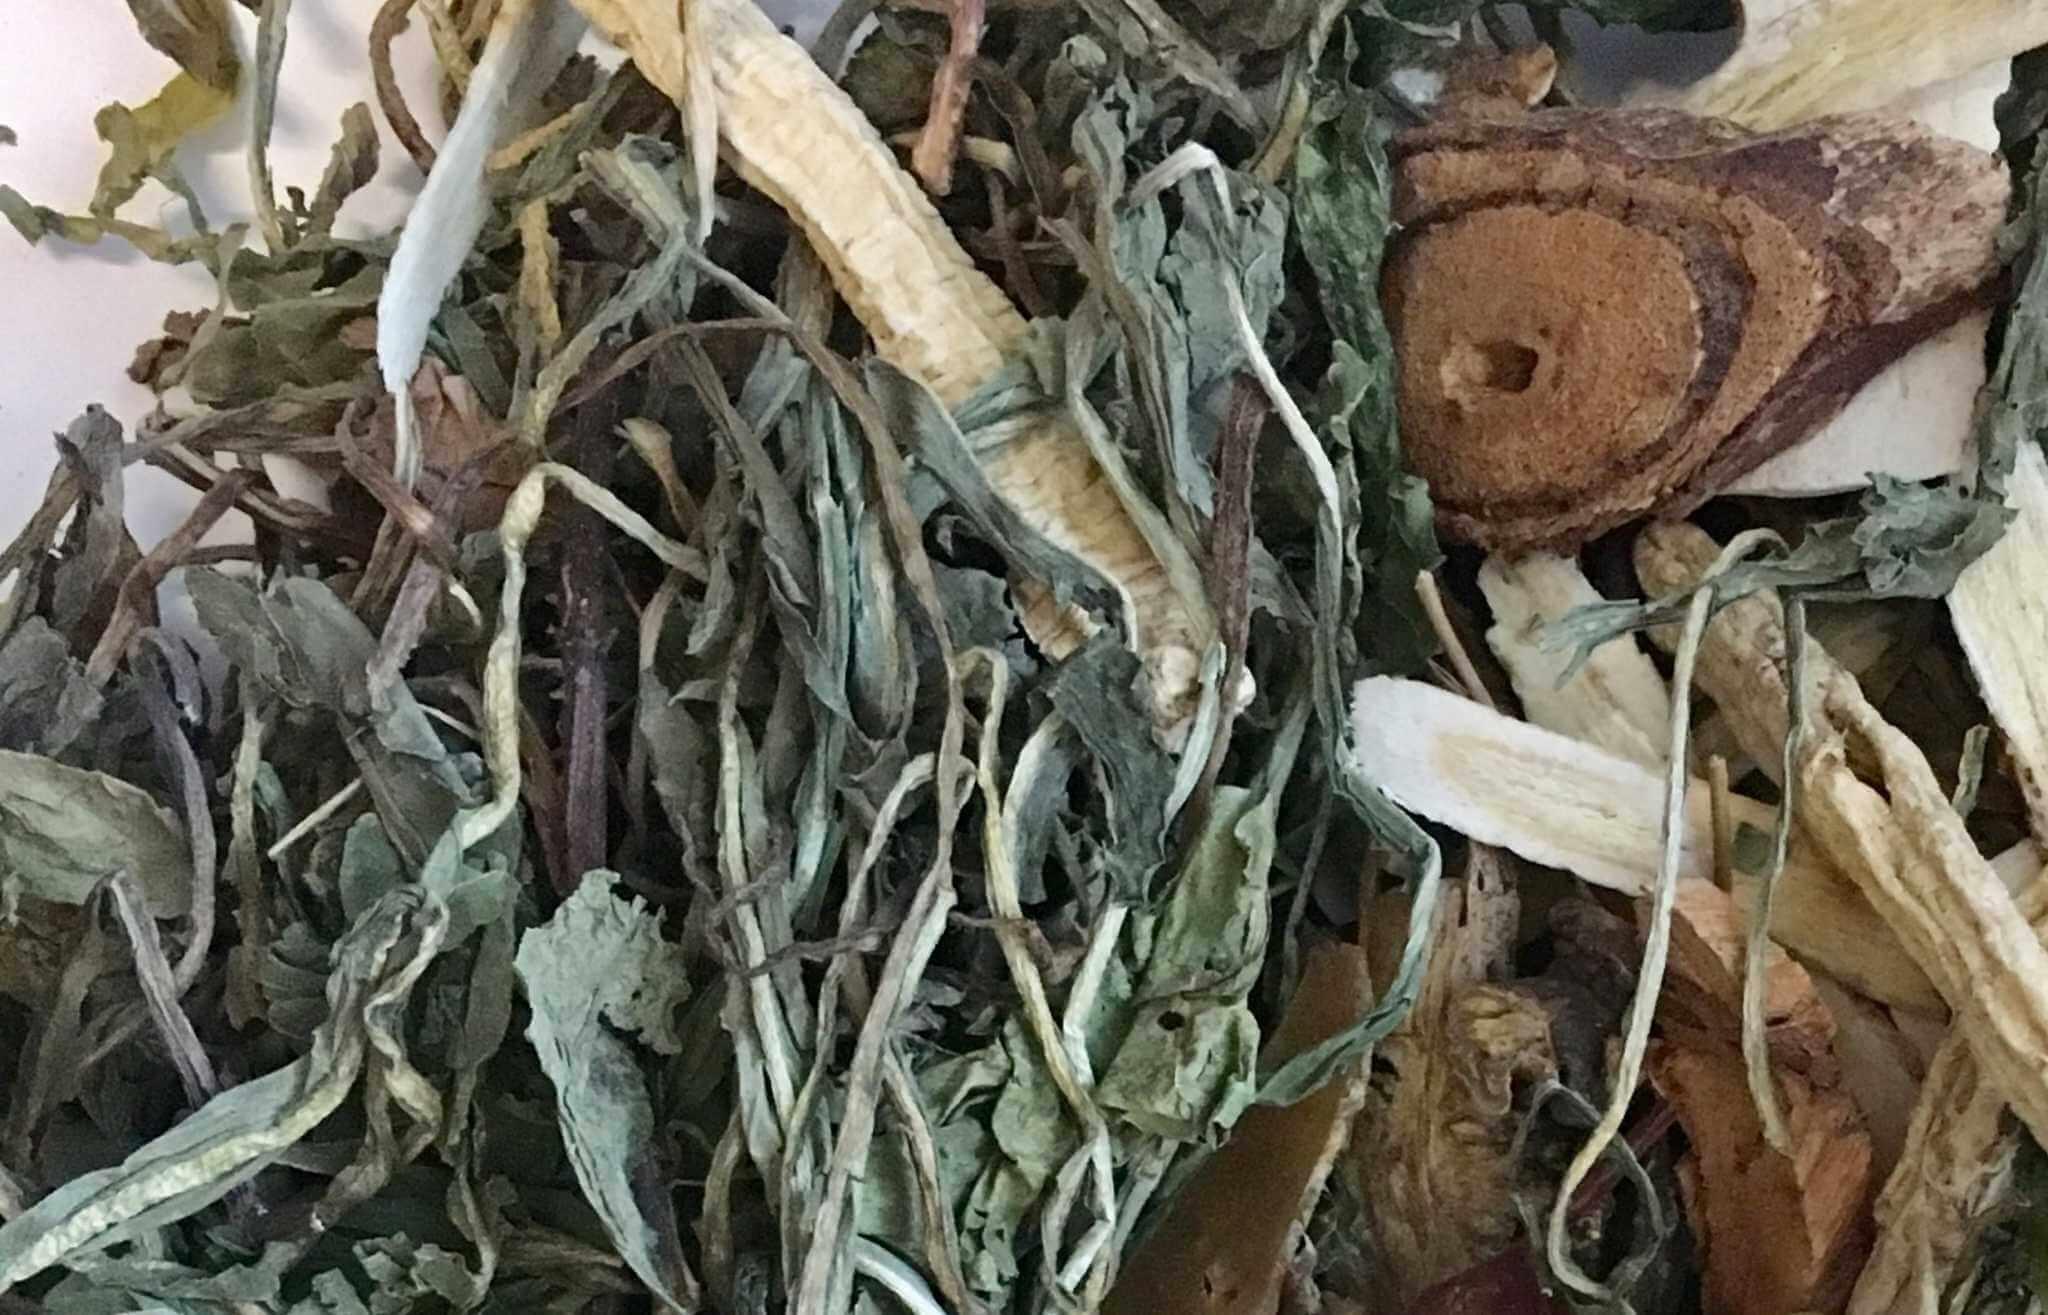 Chinatown tea poisoning